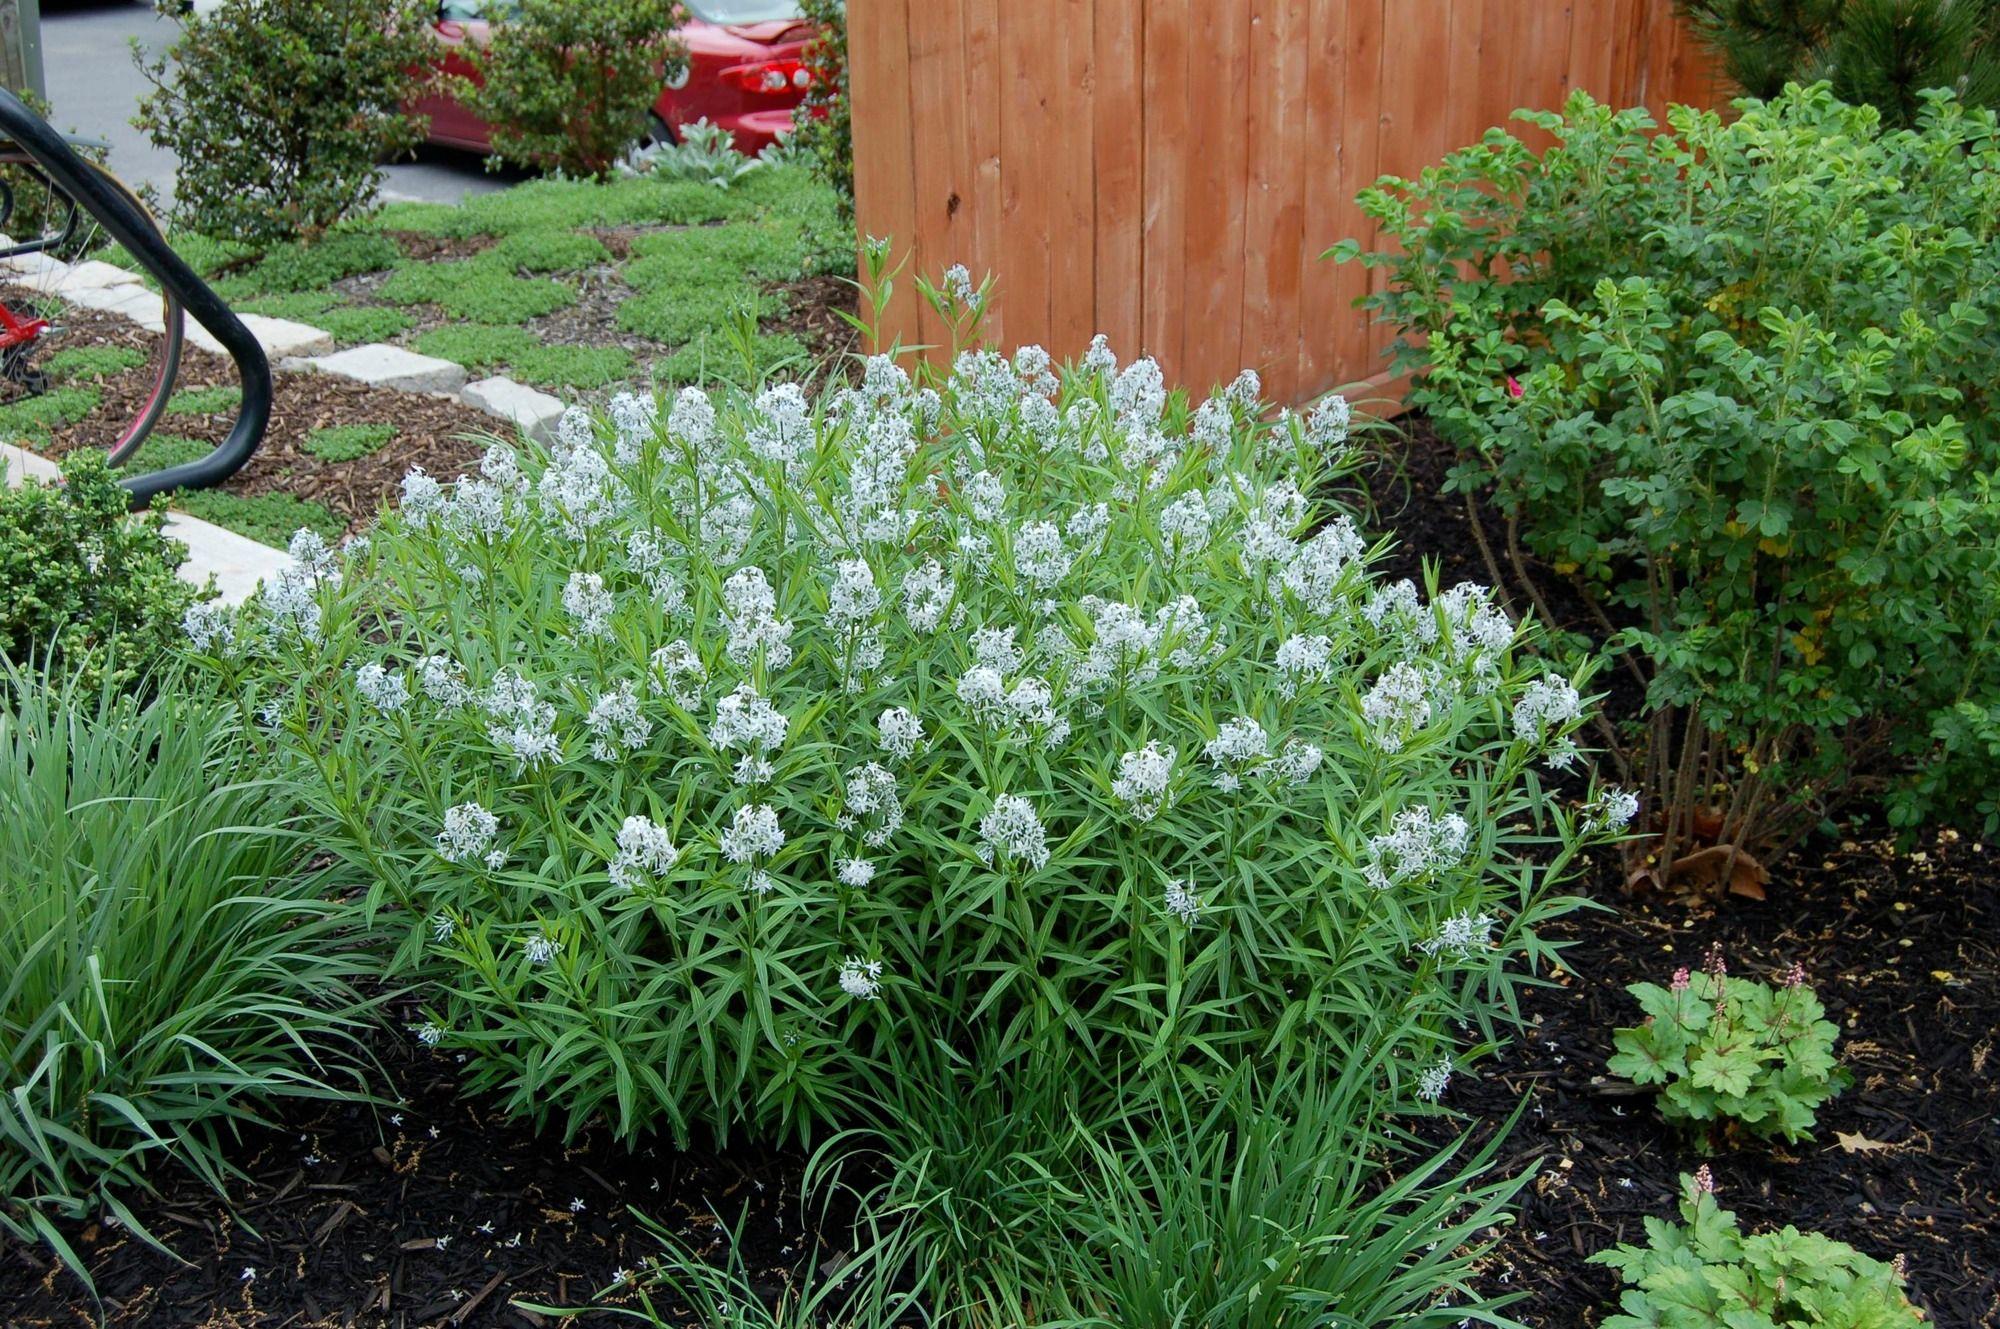 Http Shop Unquadratodigiardino It Fiori Primaverili 225 Amsonia Tabernaemontana Html Perennials Garden Design Plants